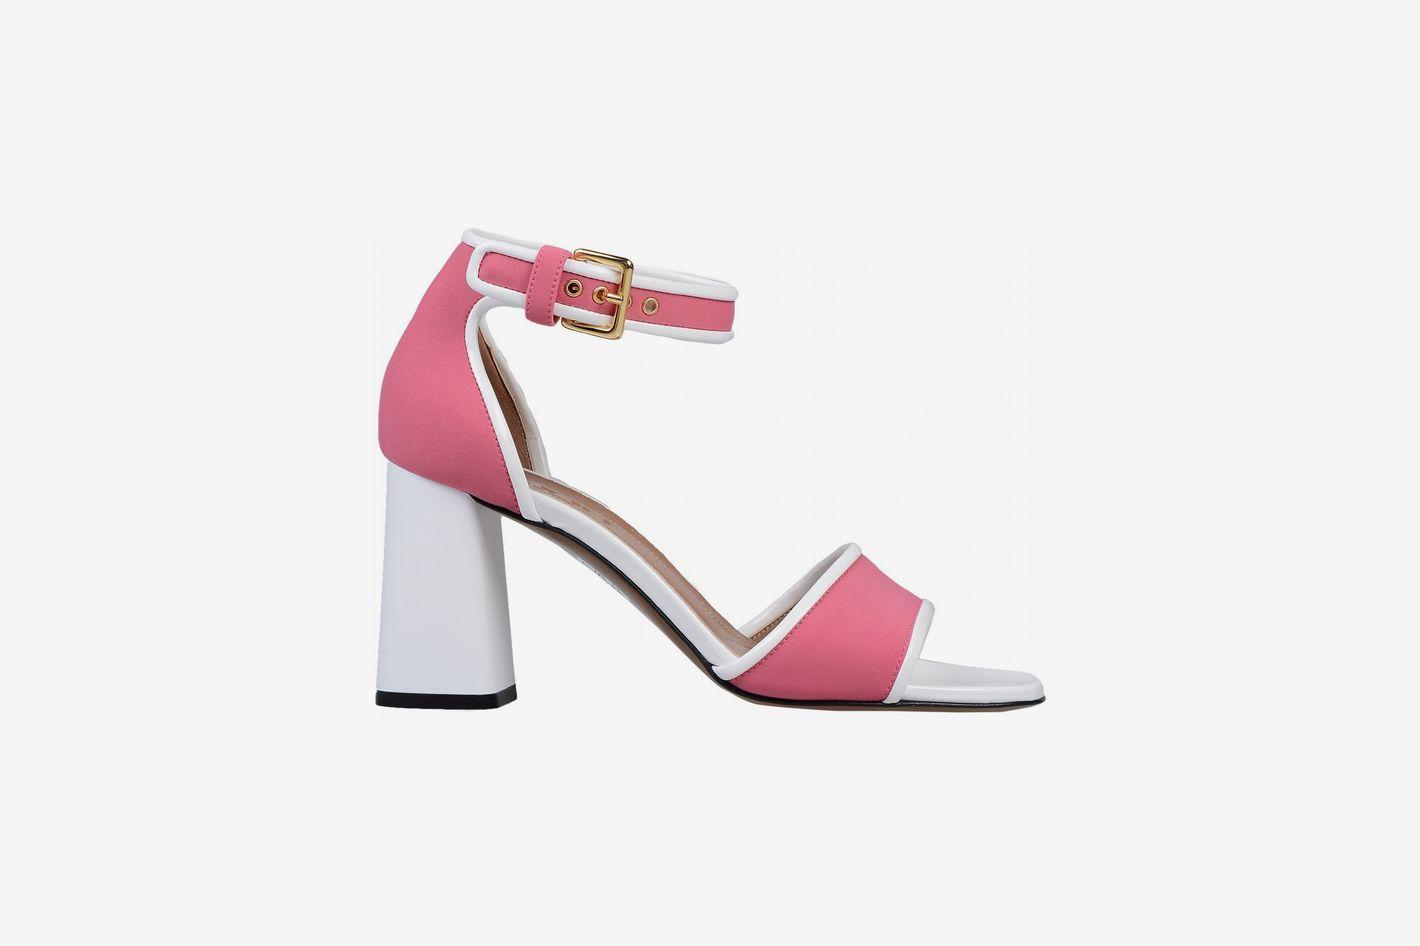 00fe3d8fdd6c Best Sandals Hoy Salt Water Sandals Review